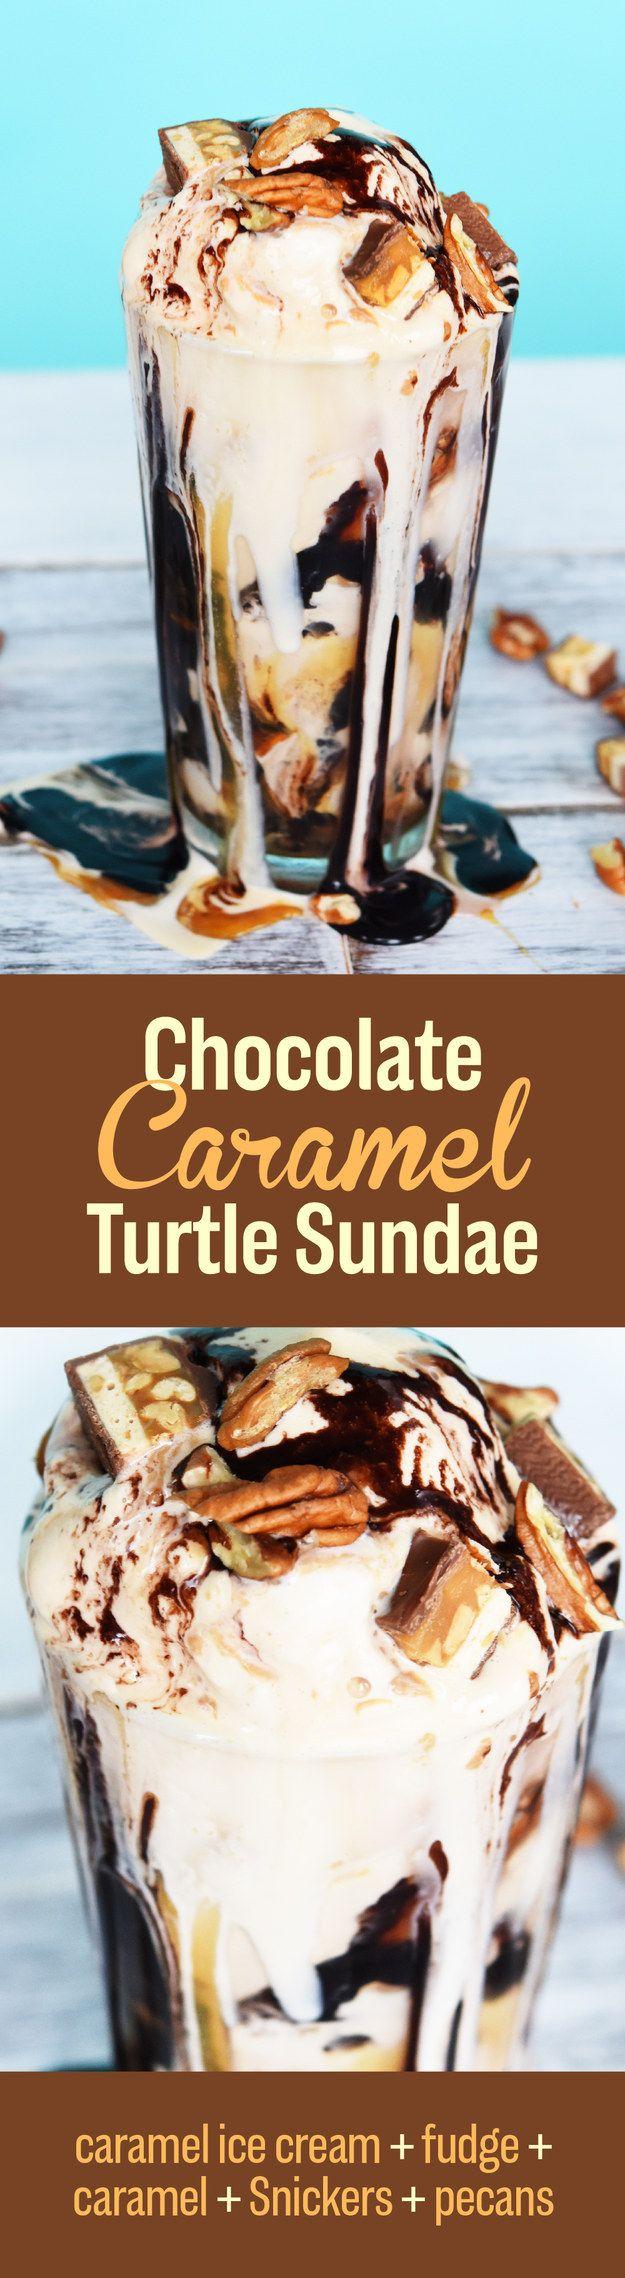 Chocolate Caramel Turtle Sundae | 7 Insanely Delicious Sundaes You Need To Eat Before Summer Is Over